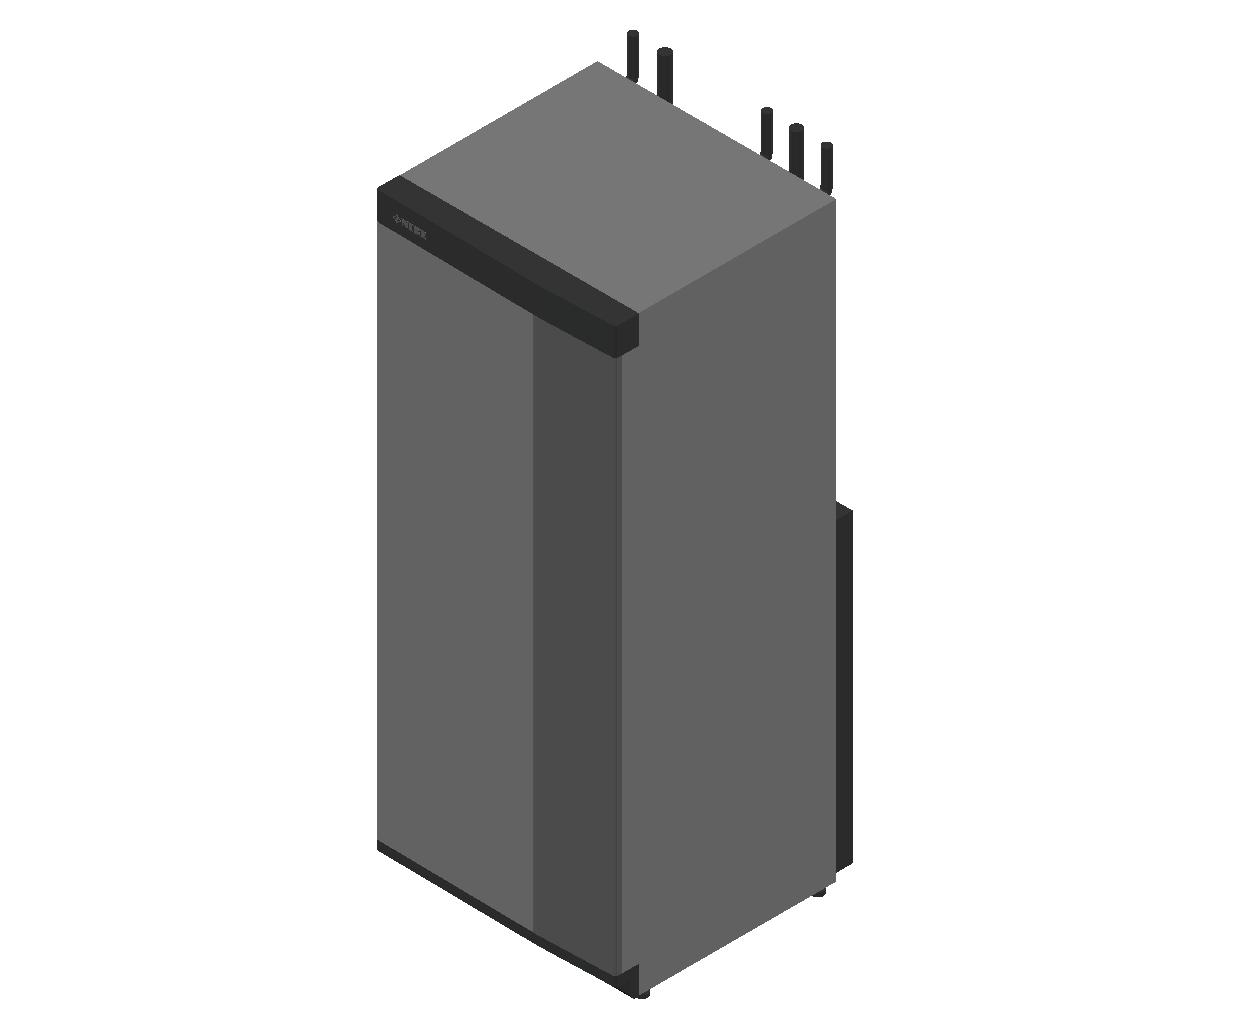 HC_Heat Pump_MEPcontent_NIBE_S1155PC-6 3x400V_INT-EN.dwg